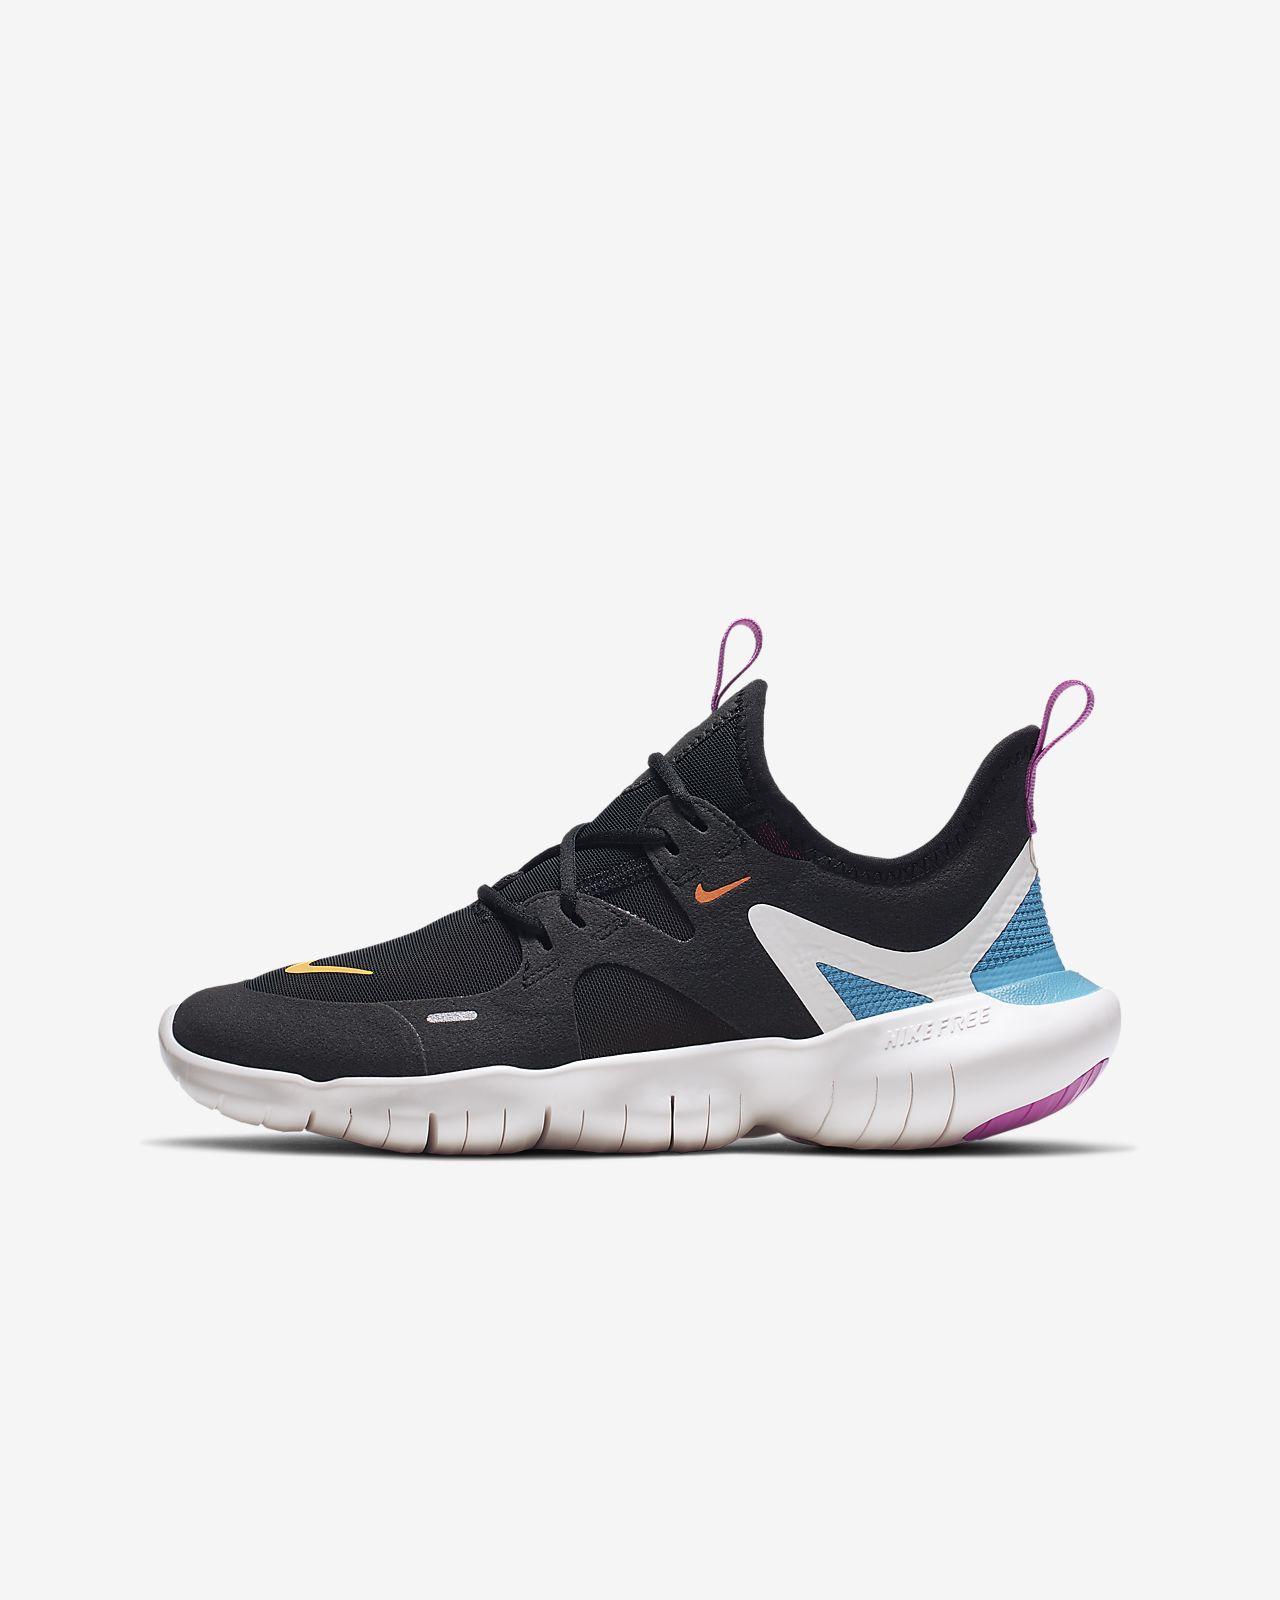 3f319f313704 Scarpa da running Nike Free RN 5.0 - Ragazzi. Nike.com IT